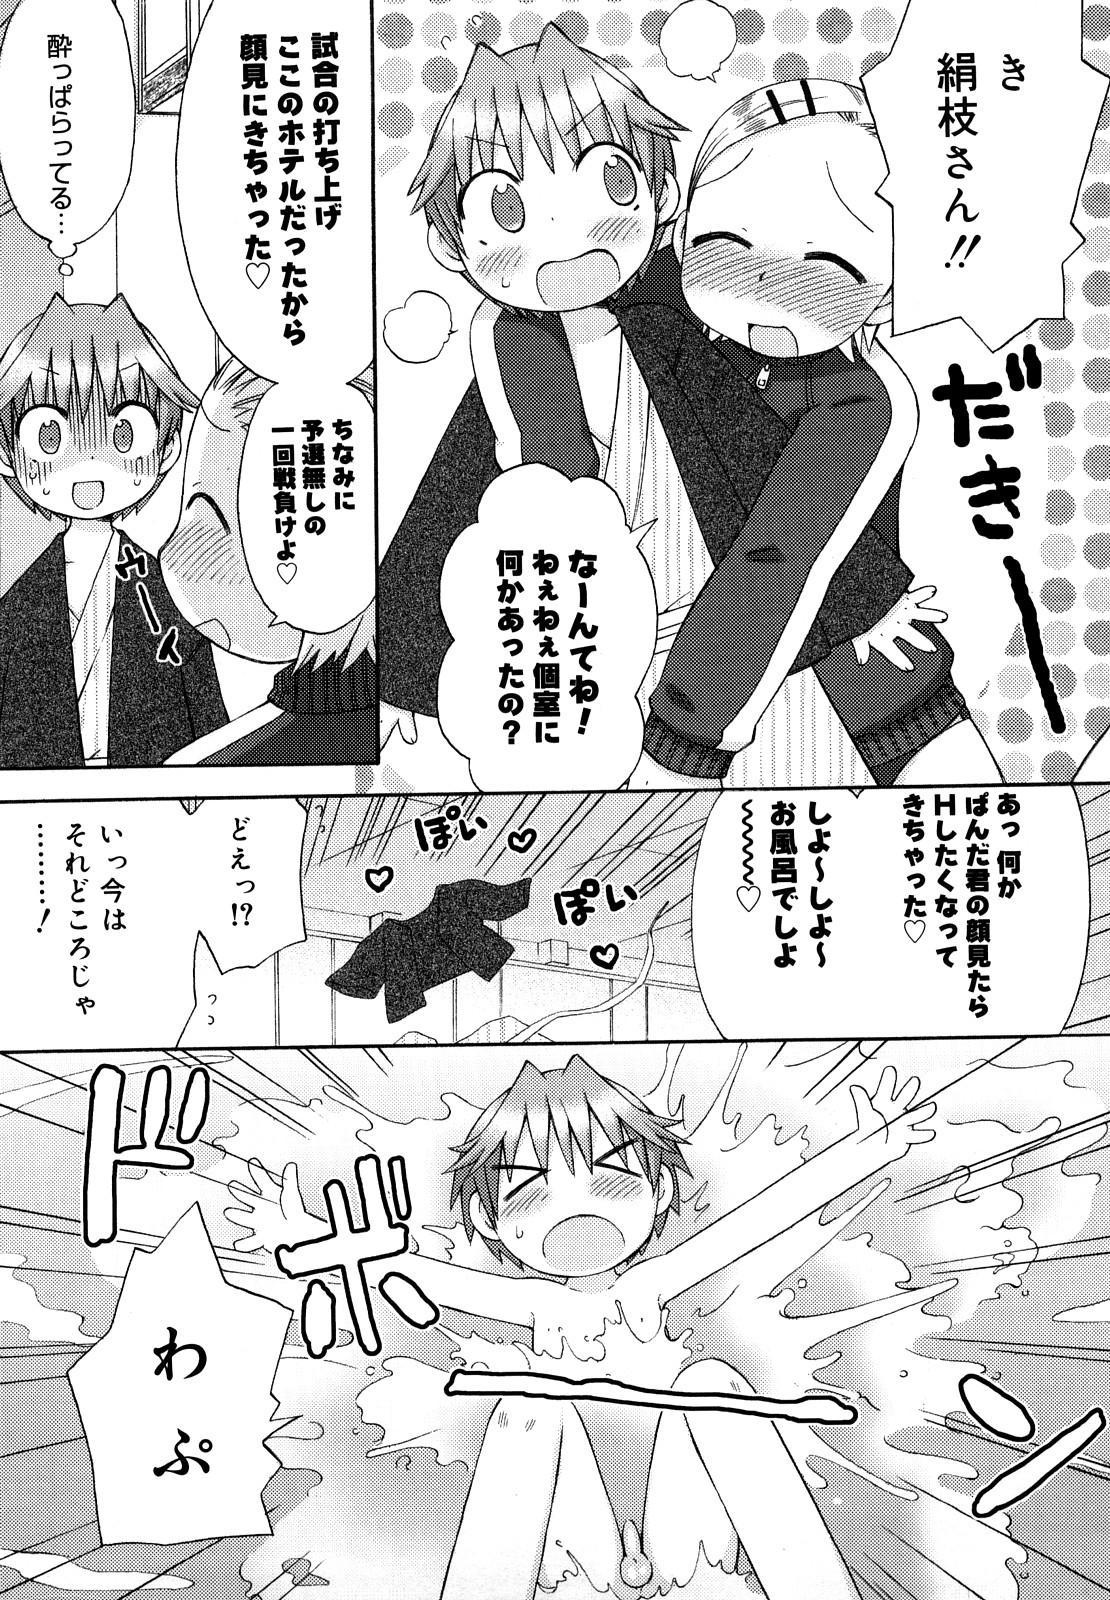 Hatsuden Pandakun! Shinsouban 135